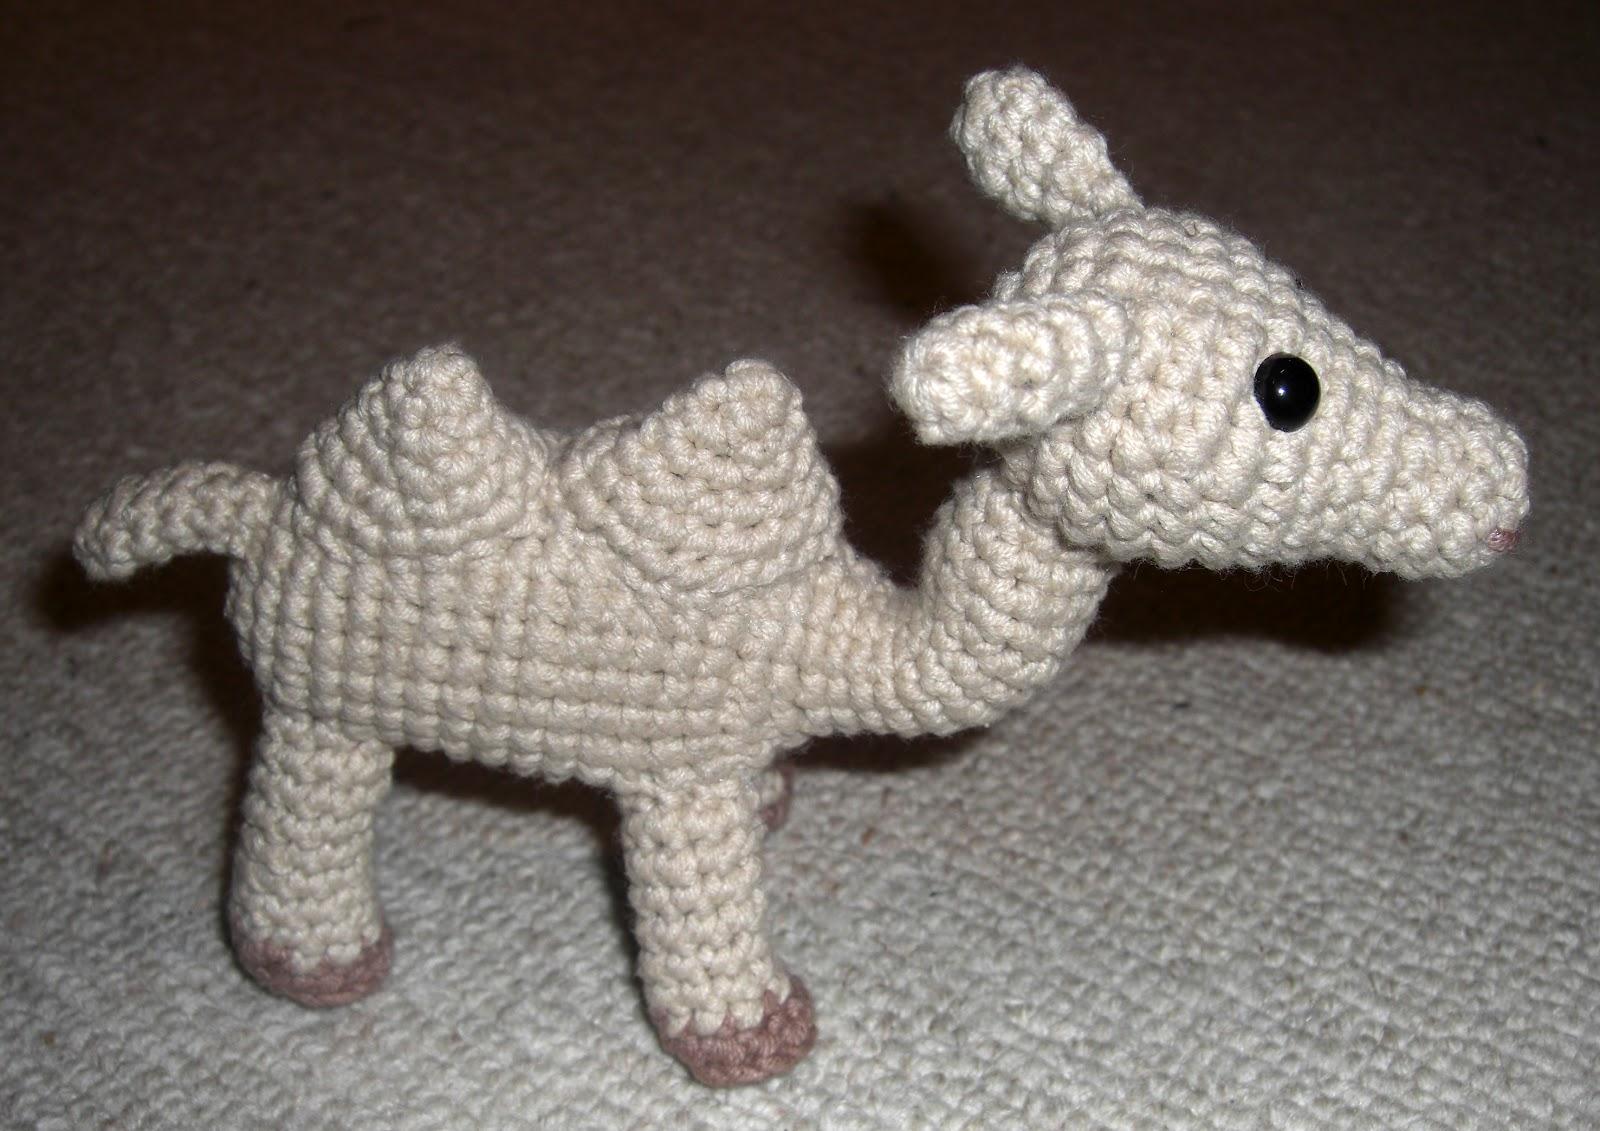 Amigurumi Iggle Piggle : Garngalning!: oktober 2012